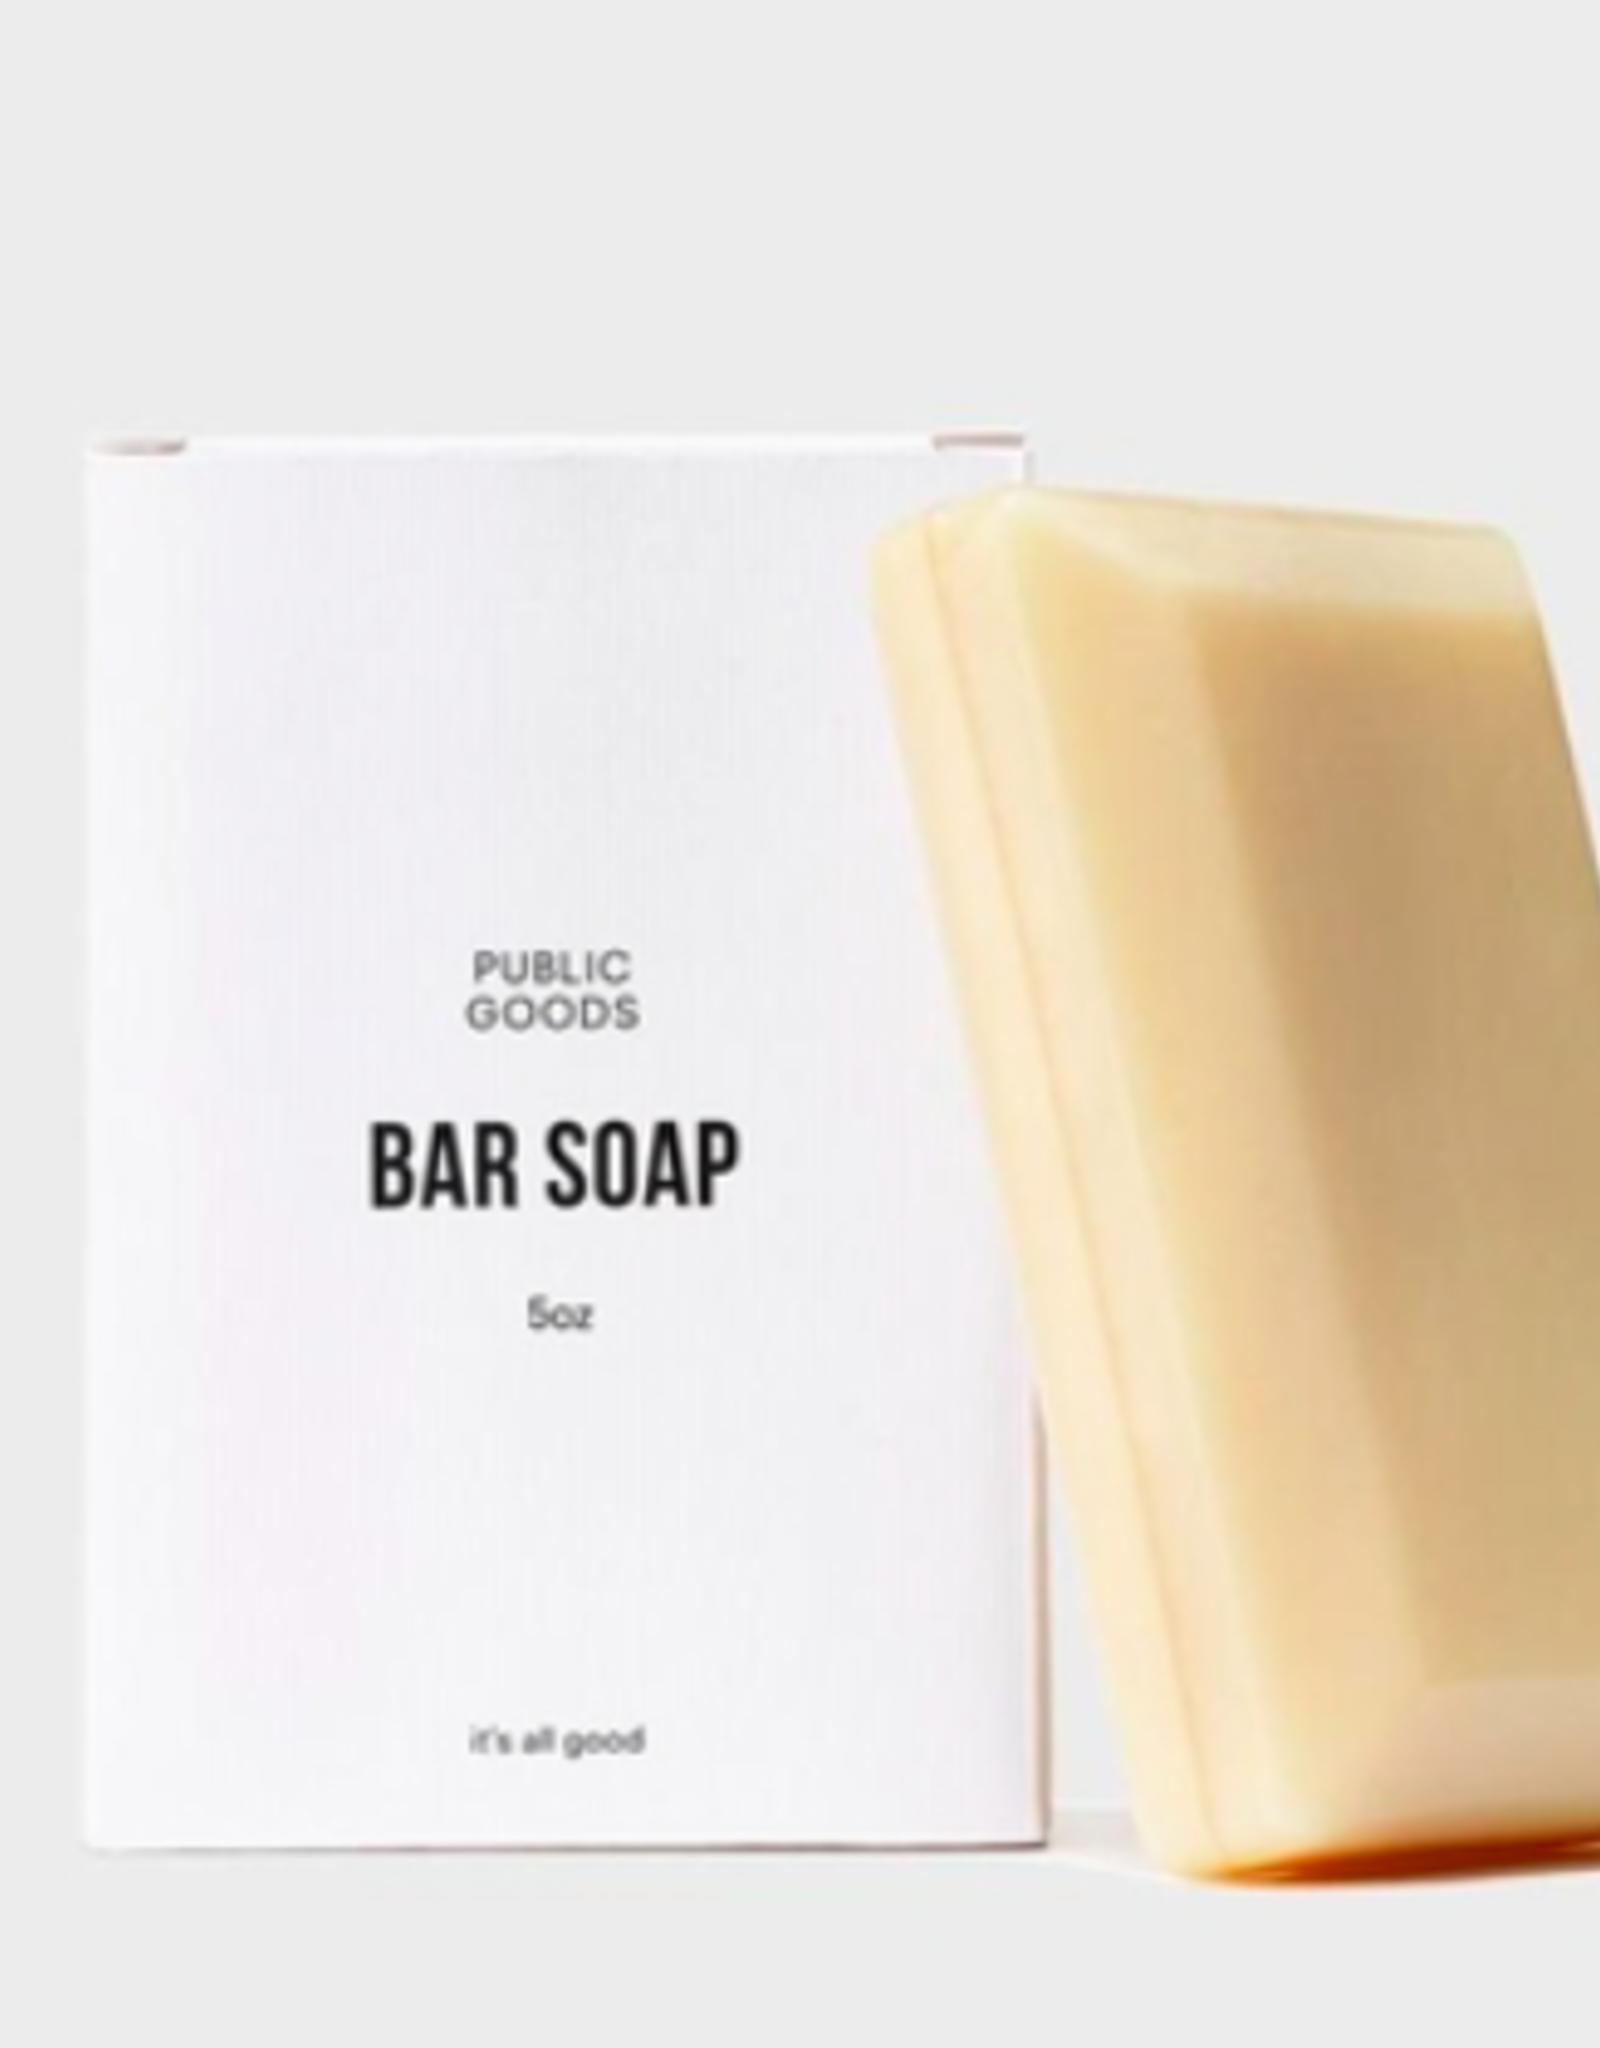 Public Goods Bar Soap 5 oz